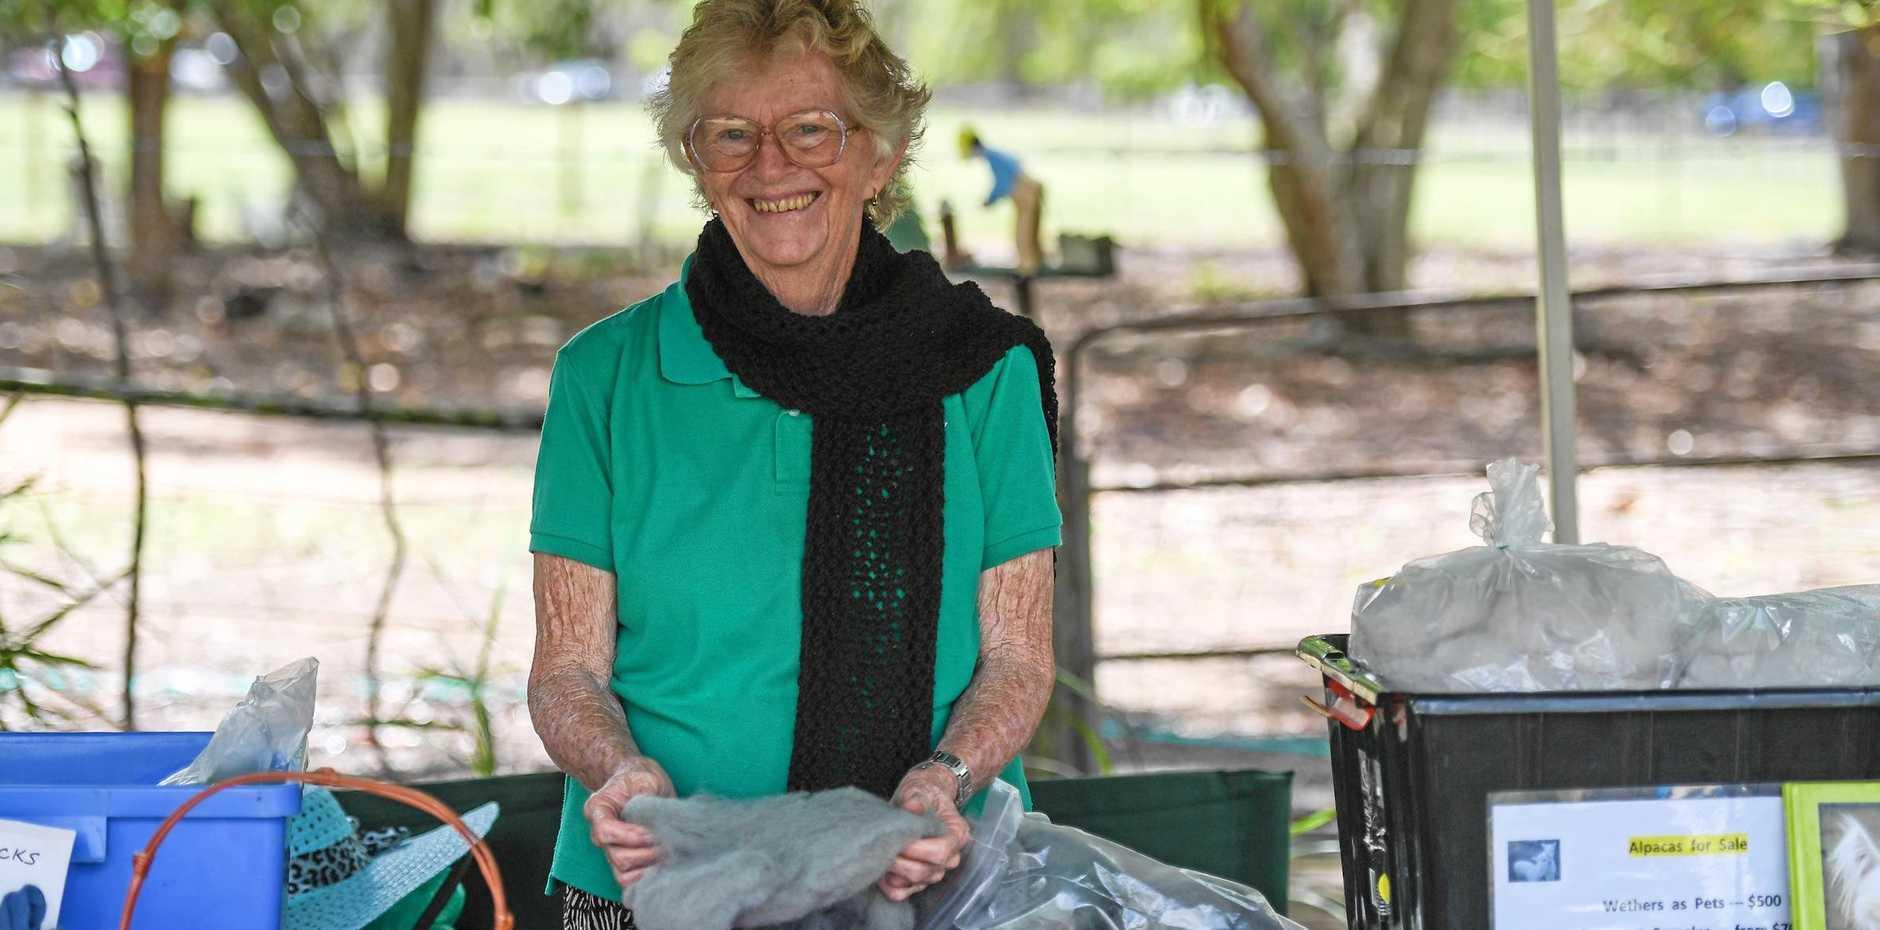 OPEN DAY: Sylvia Hyland appreciates the softness of alpaca wool at the Allyhar Alpacas open day.